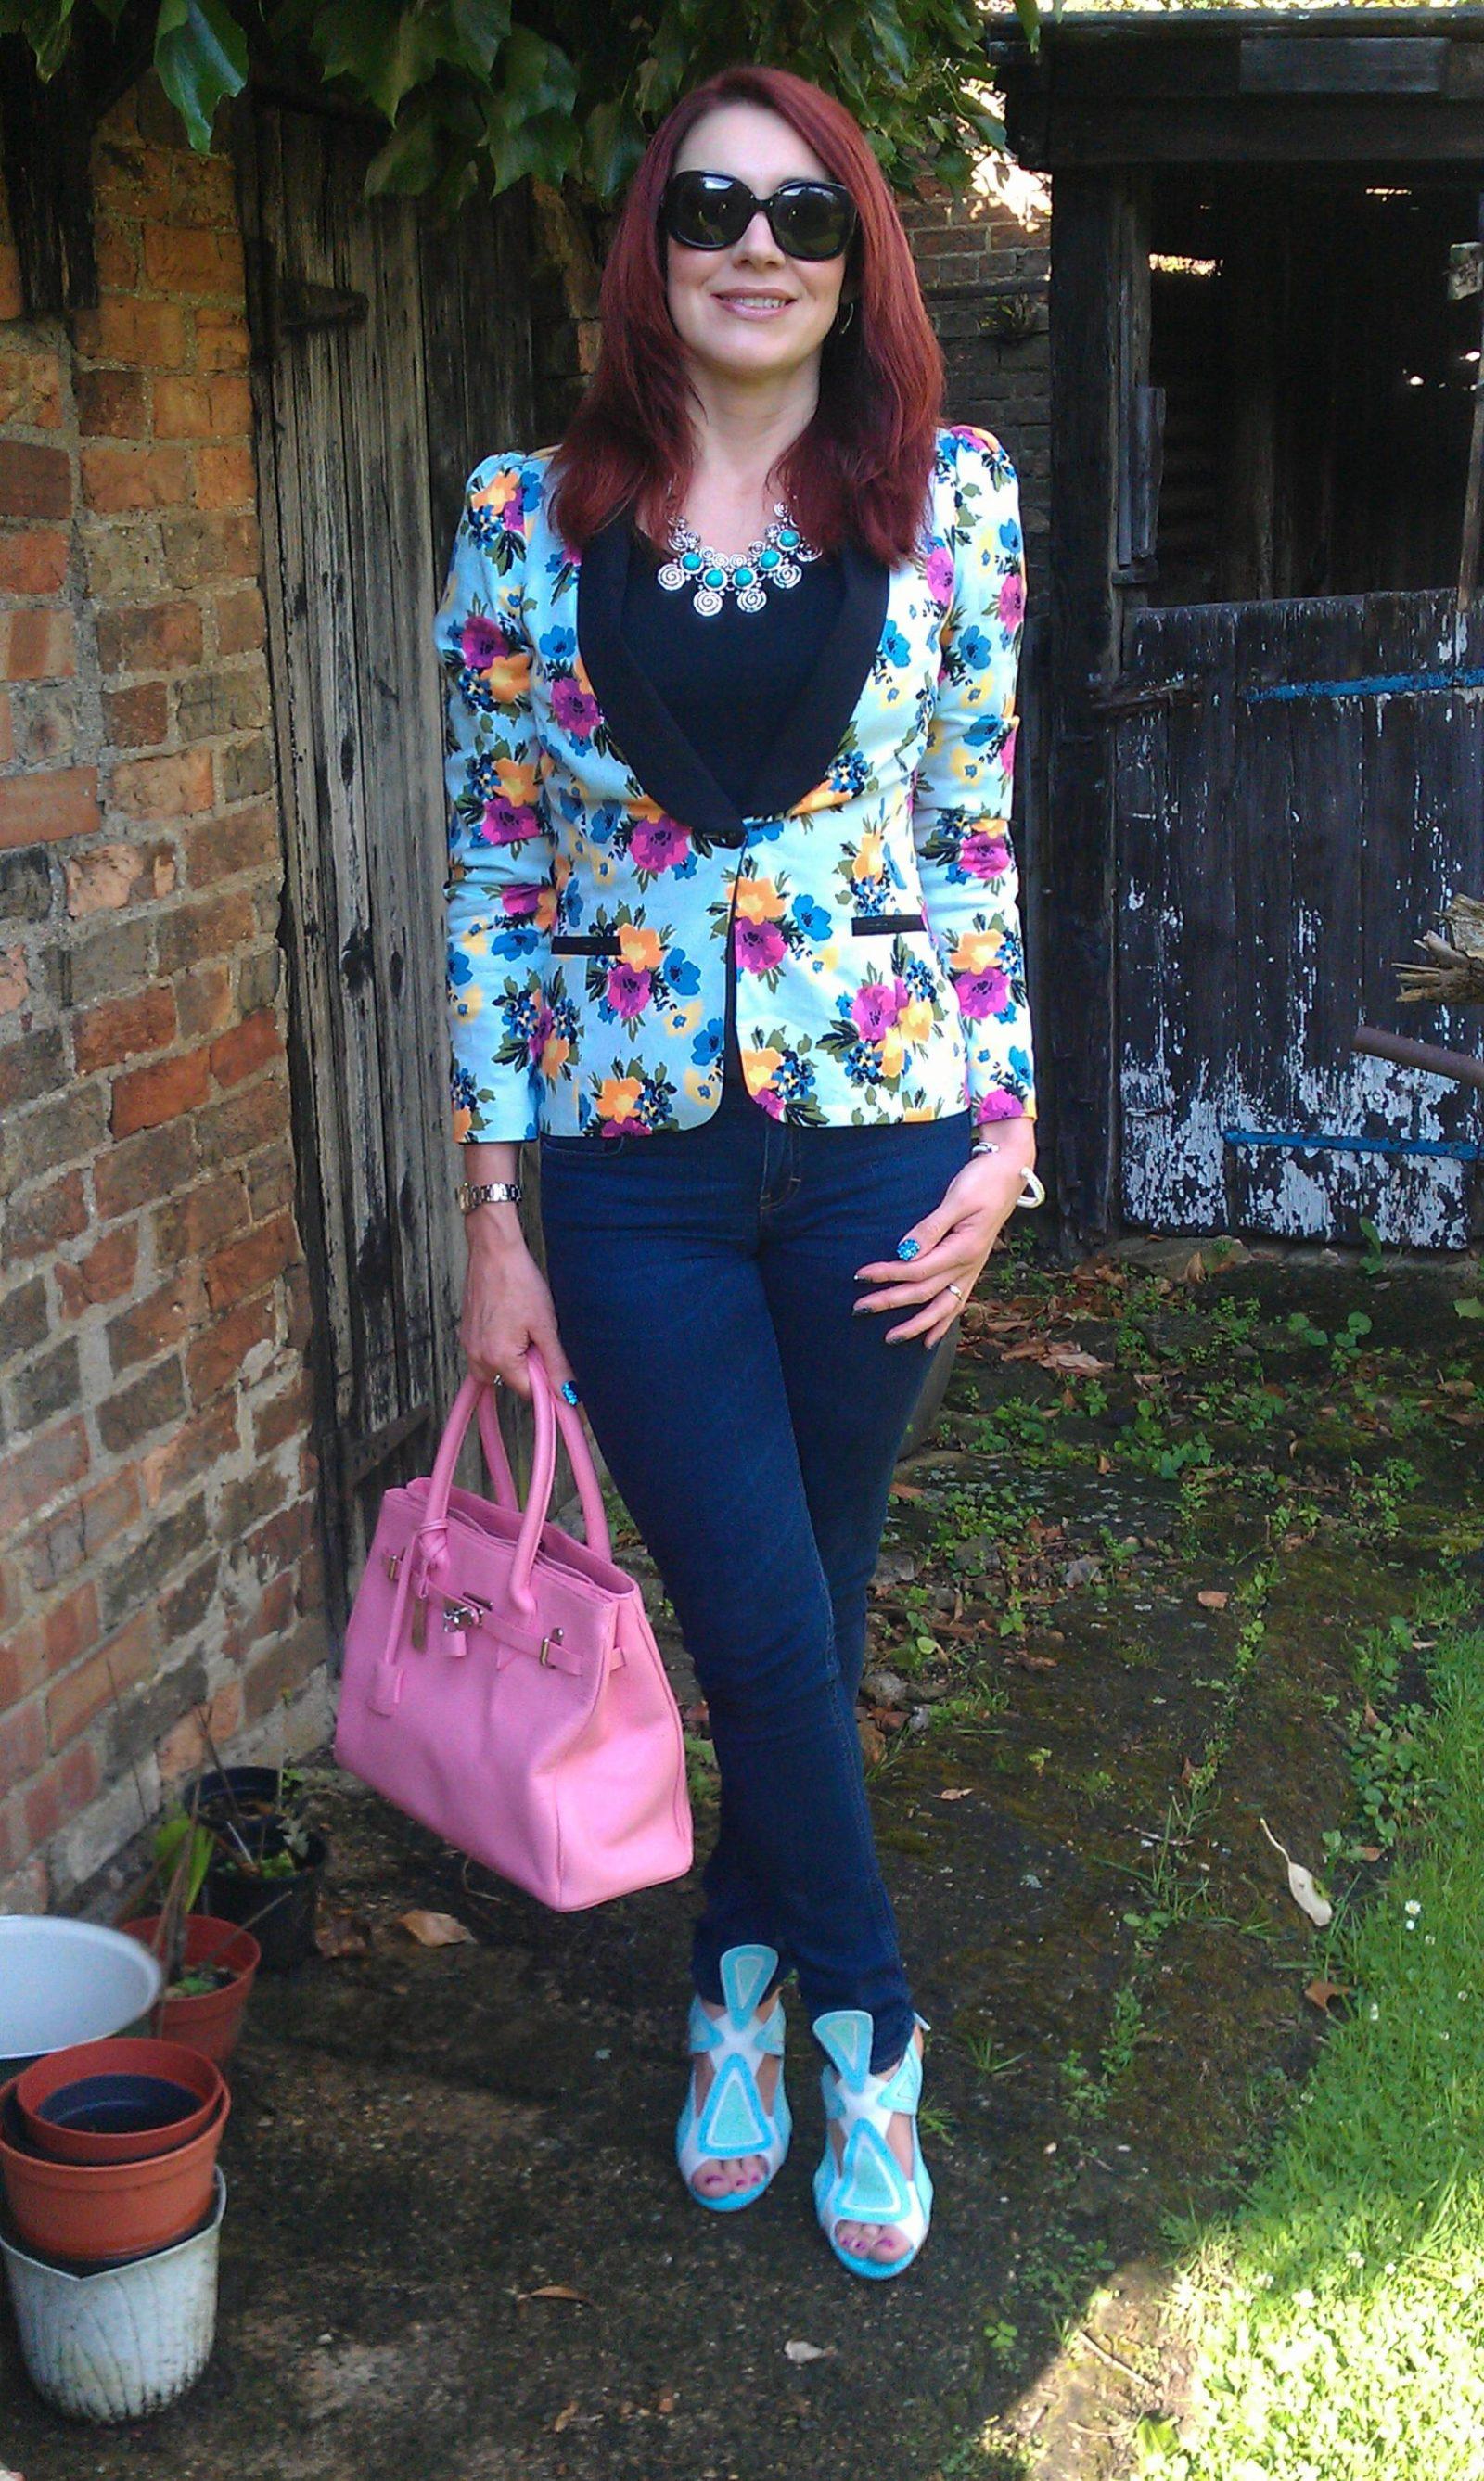 Julien Macdonald floral Print Jacket and Skinny Jeans, J by Jasper Conran pink tote bag, Strutt Couture blue sandals